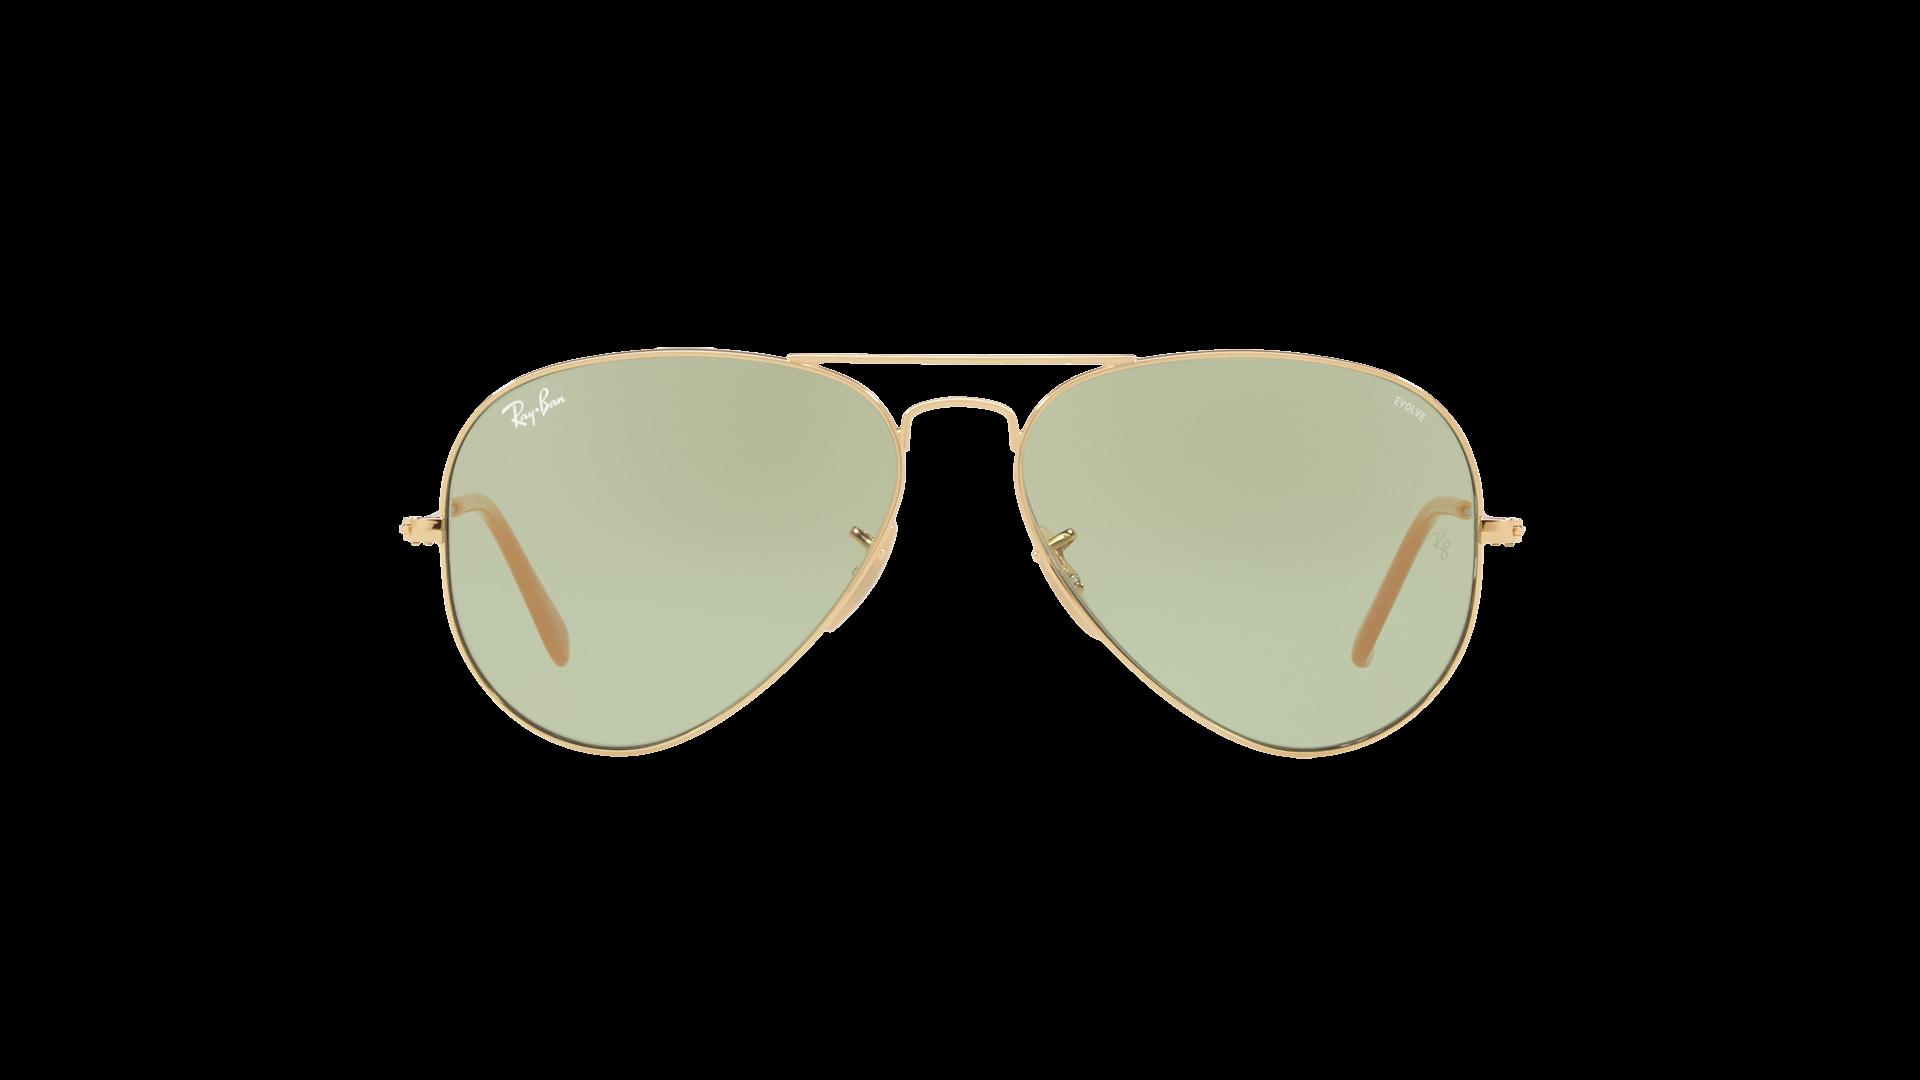 5722e8b96 Sunglasses Ray-Ban Aviator Evolve Gold RB3025 9064/4C 55-14 Small  Photochromic